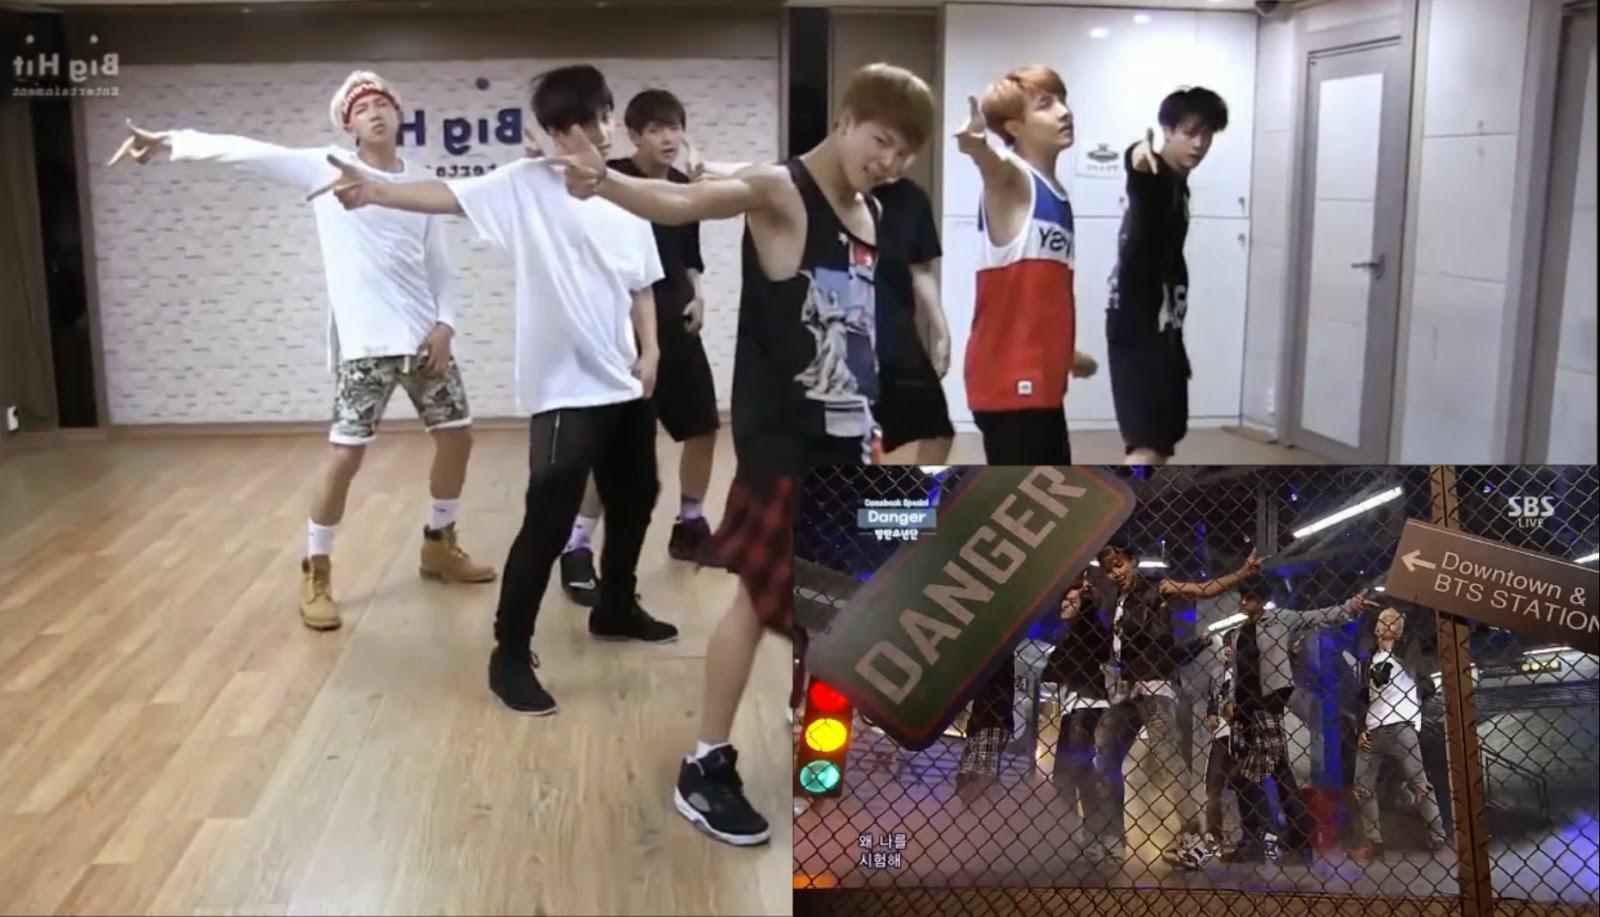 BTS Bangtan Boys: Danger - AREA51su Blog Video